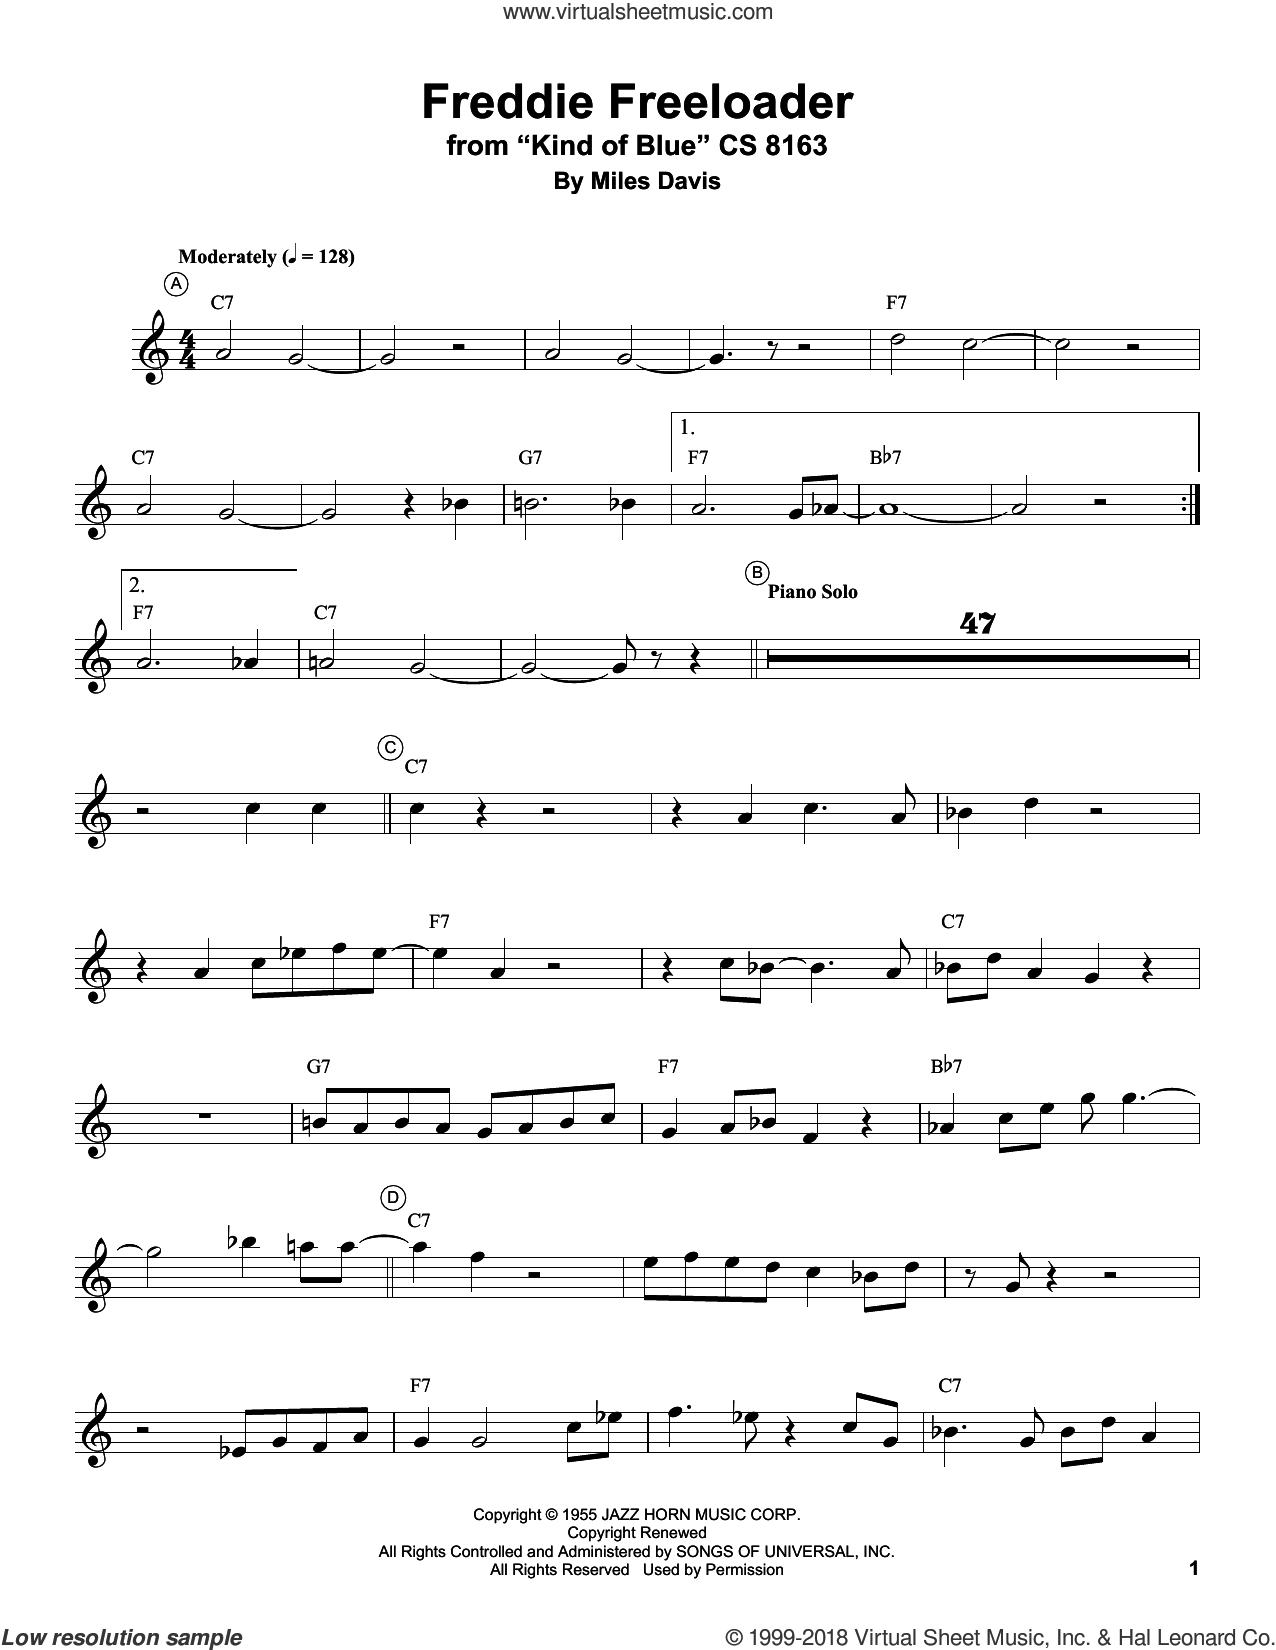 Freddie Freeloader sheet music for trumpet solo (transcription) by Miles Davis, intermediate trumpet (transcription)